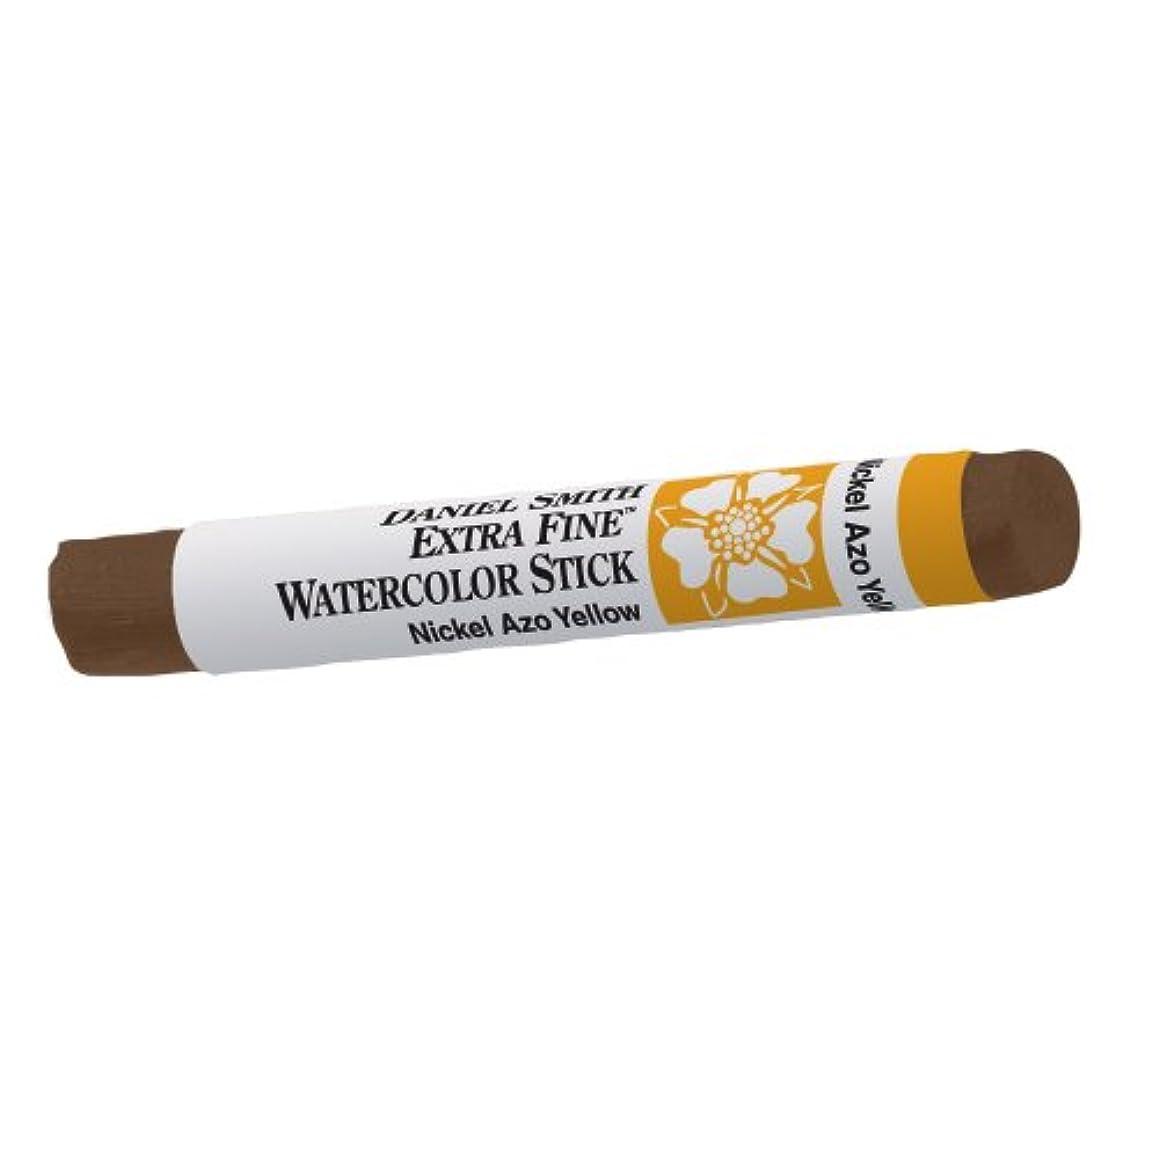 DANIEL SMITH Extra Fine Watercolor Stick 12ml Paint Tube, Nickel AZO Yellow